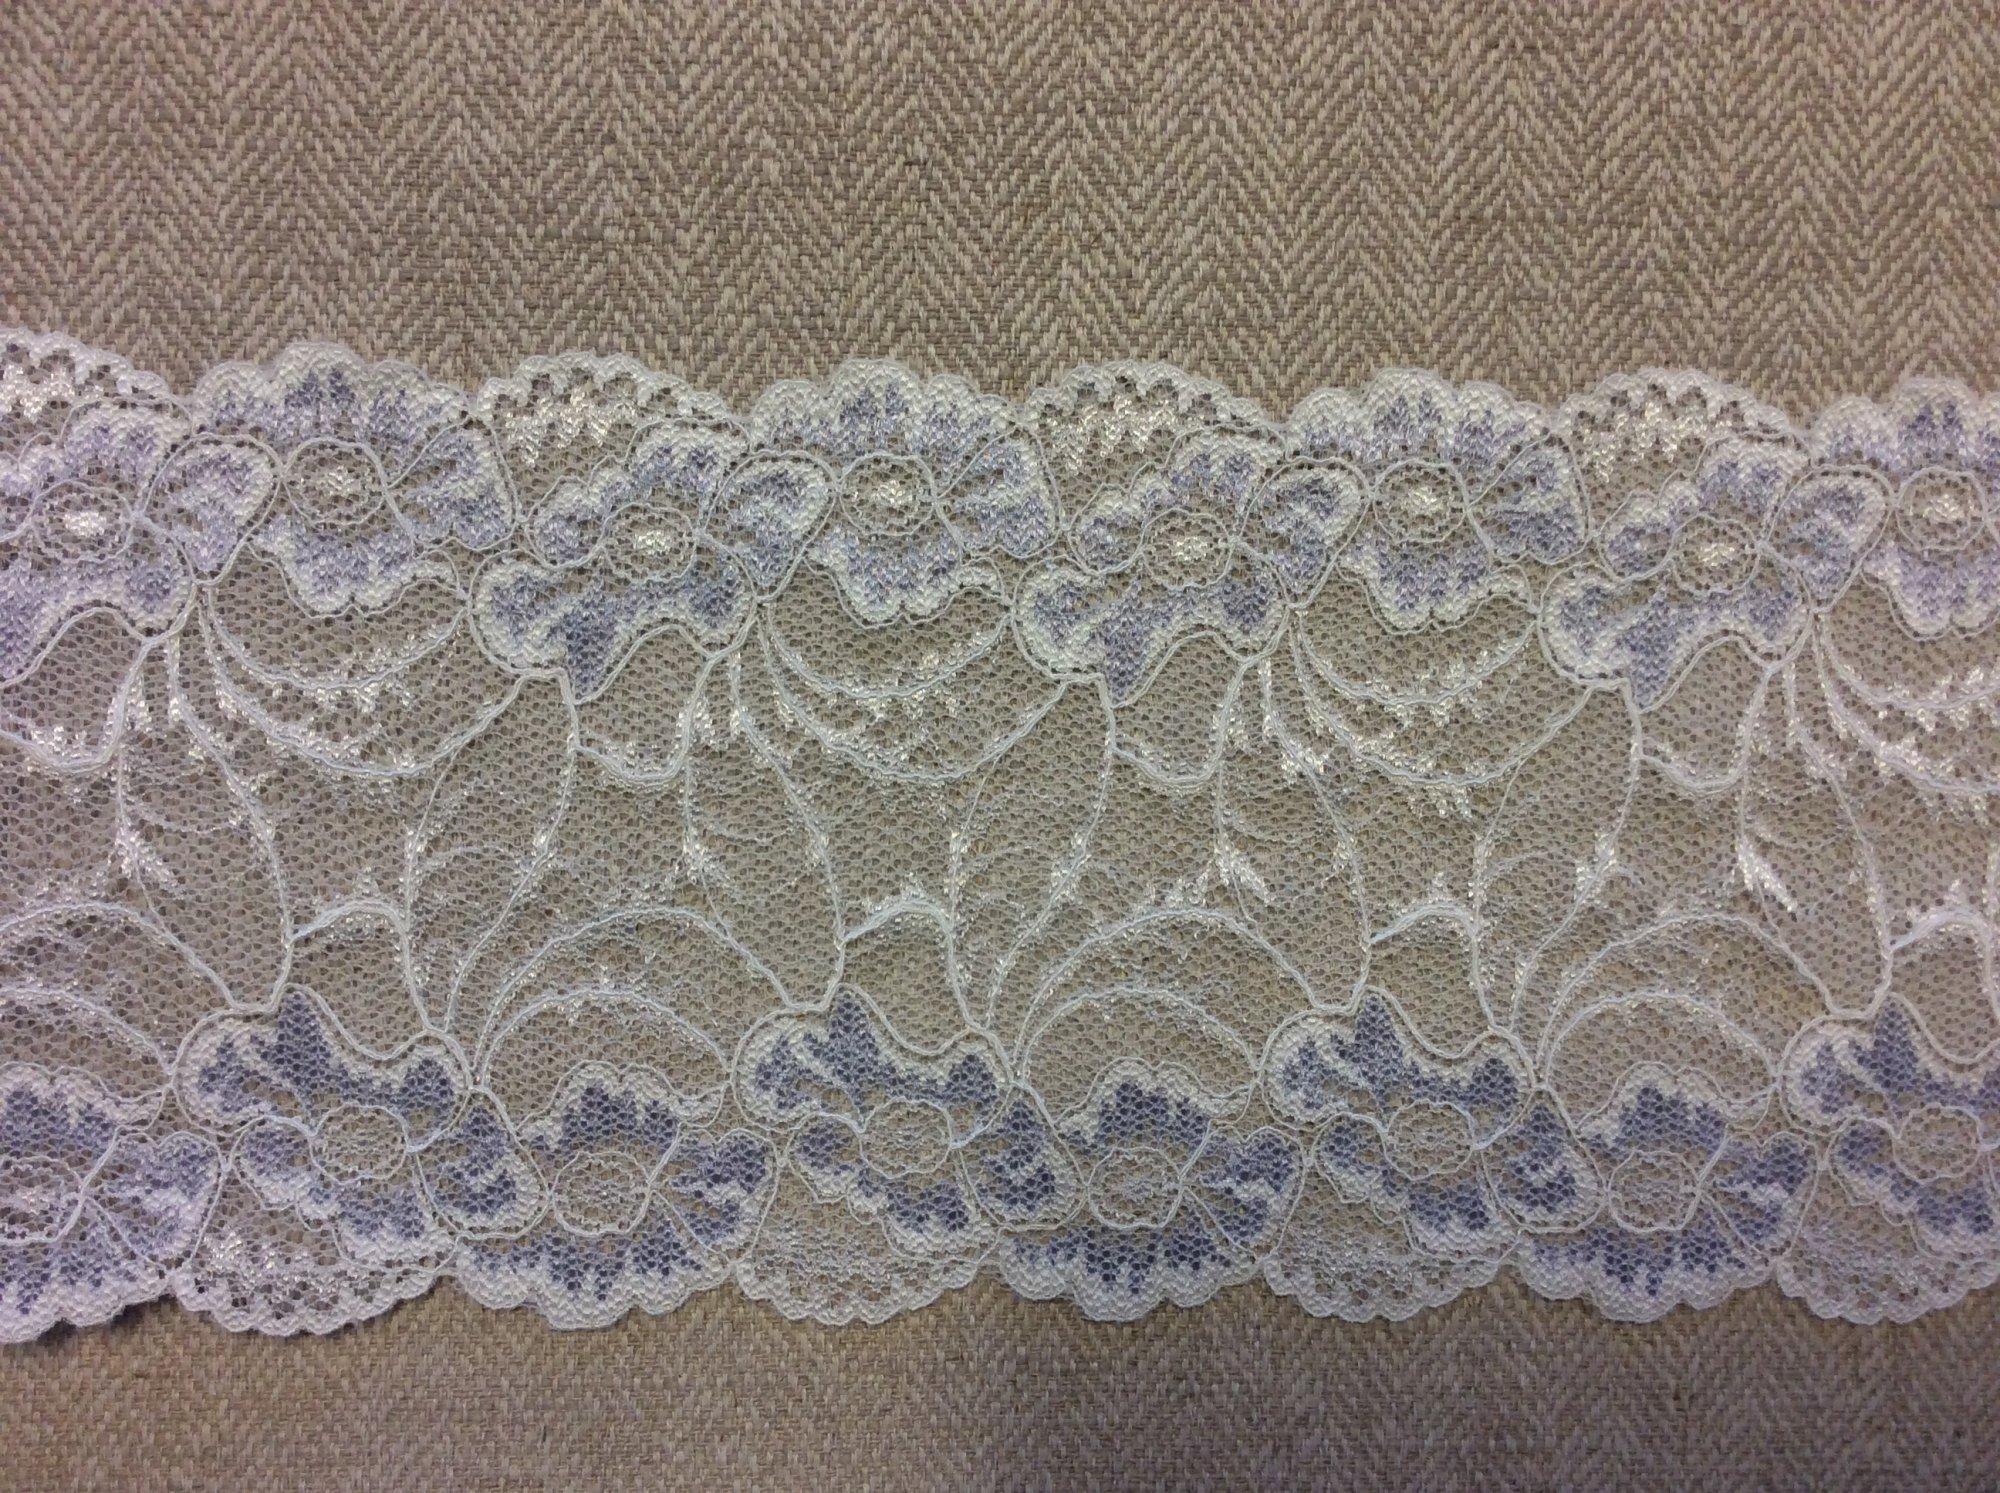 Stretch Lace White with Light Blue Floral Details Trim Apparel TRIM968